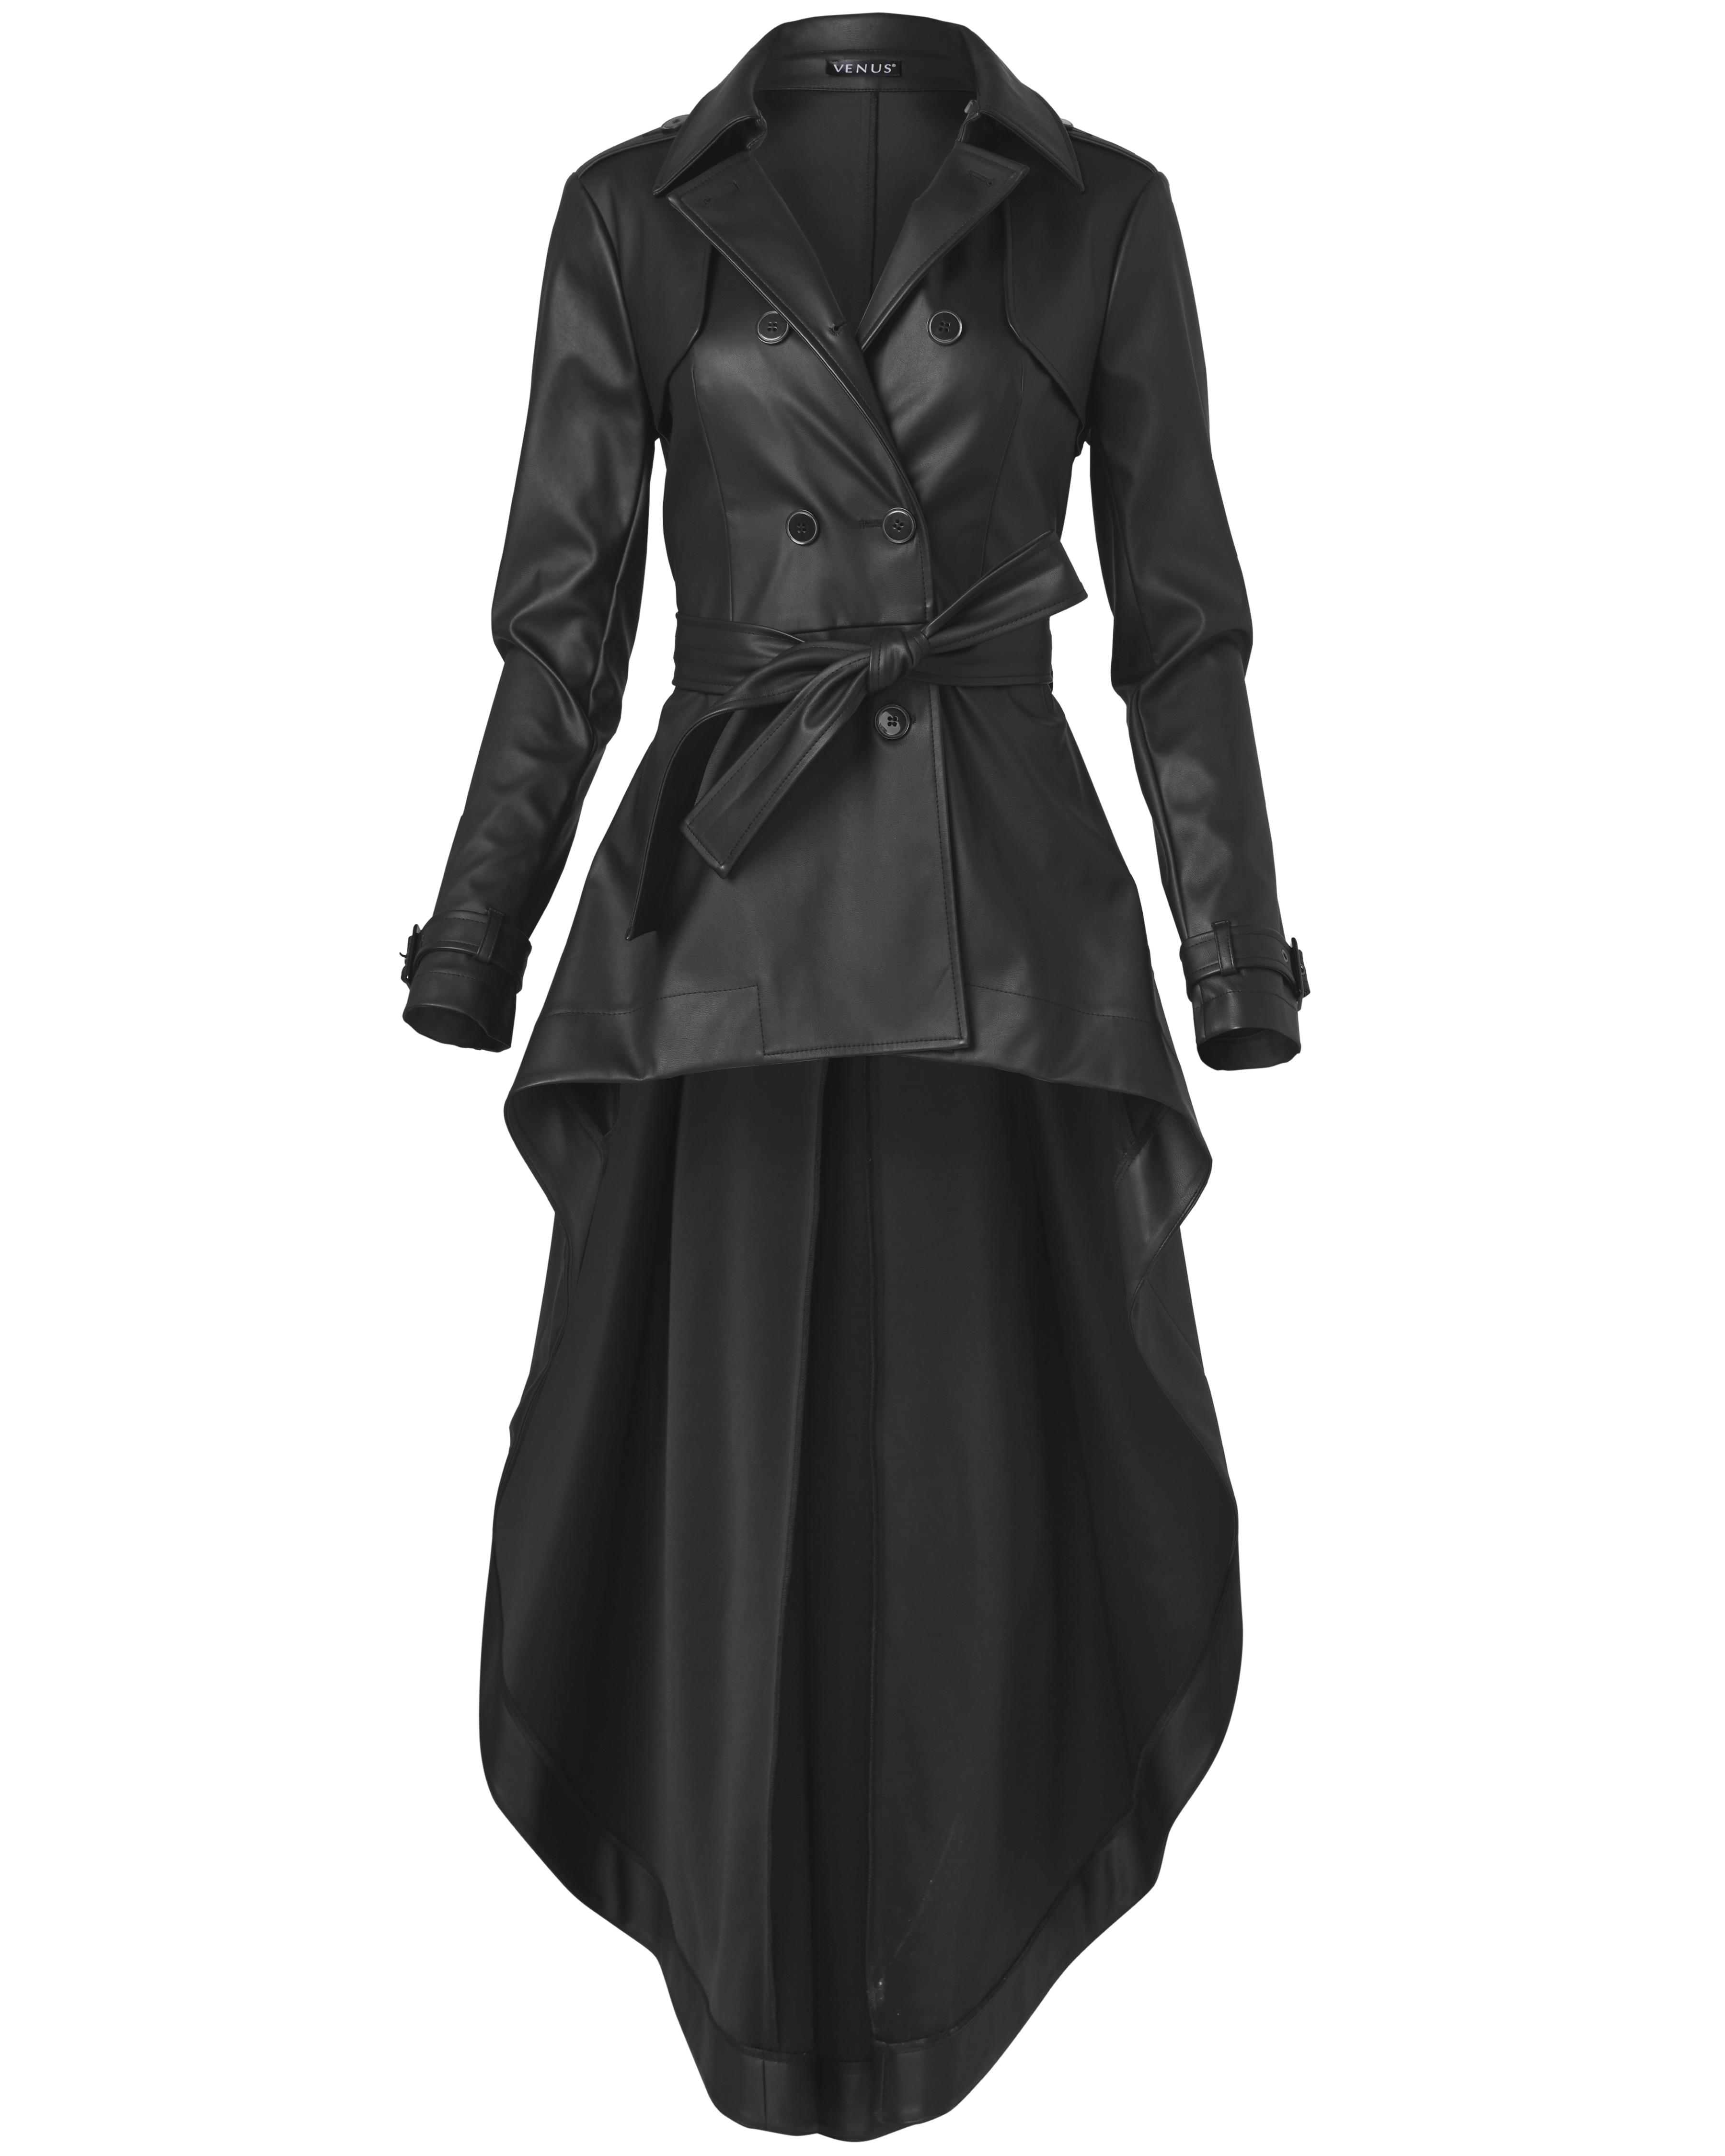 Venus blackfaux leather trench coat, schitts creek gift ideas